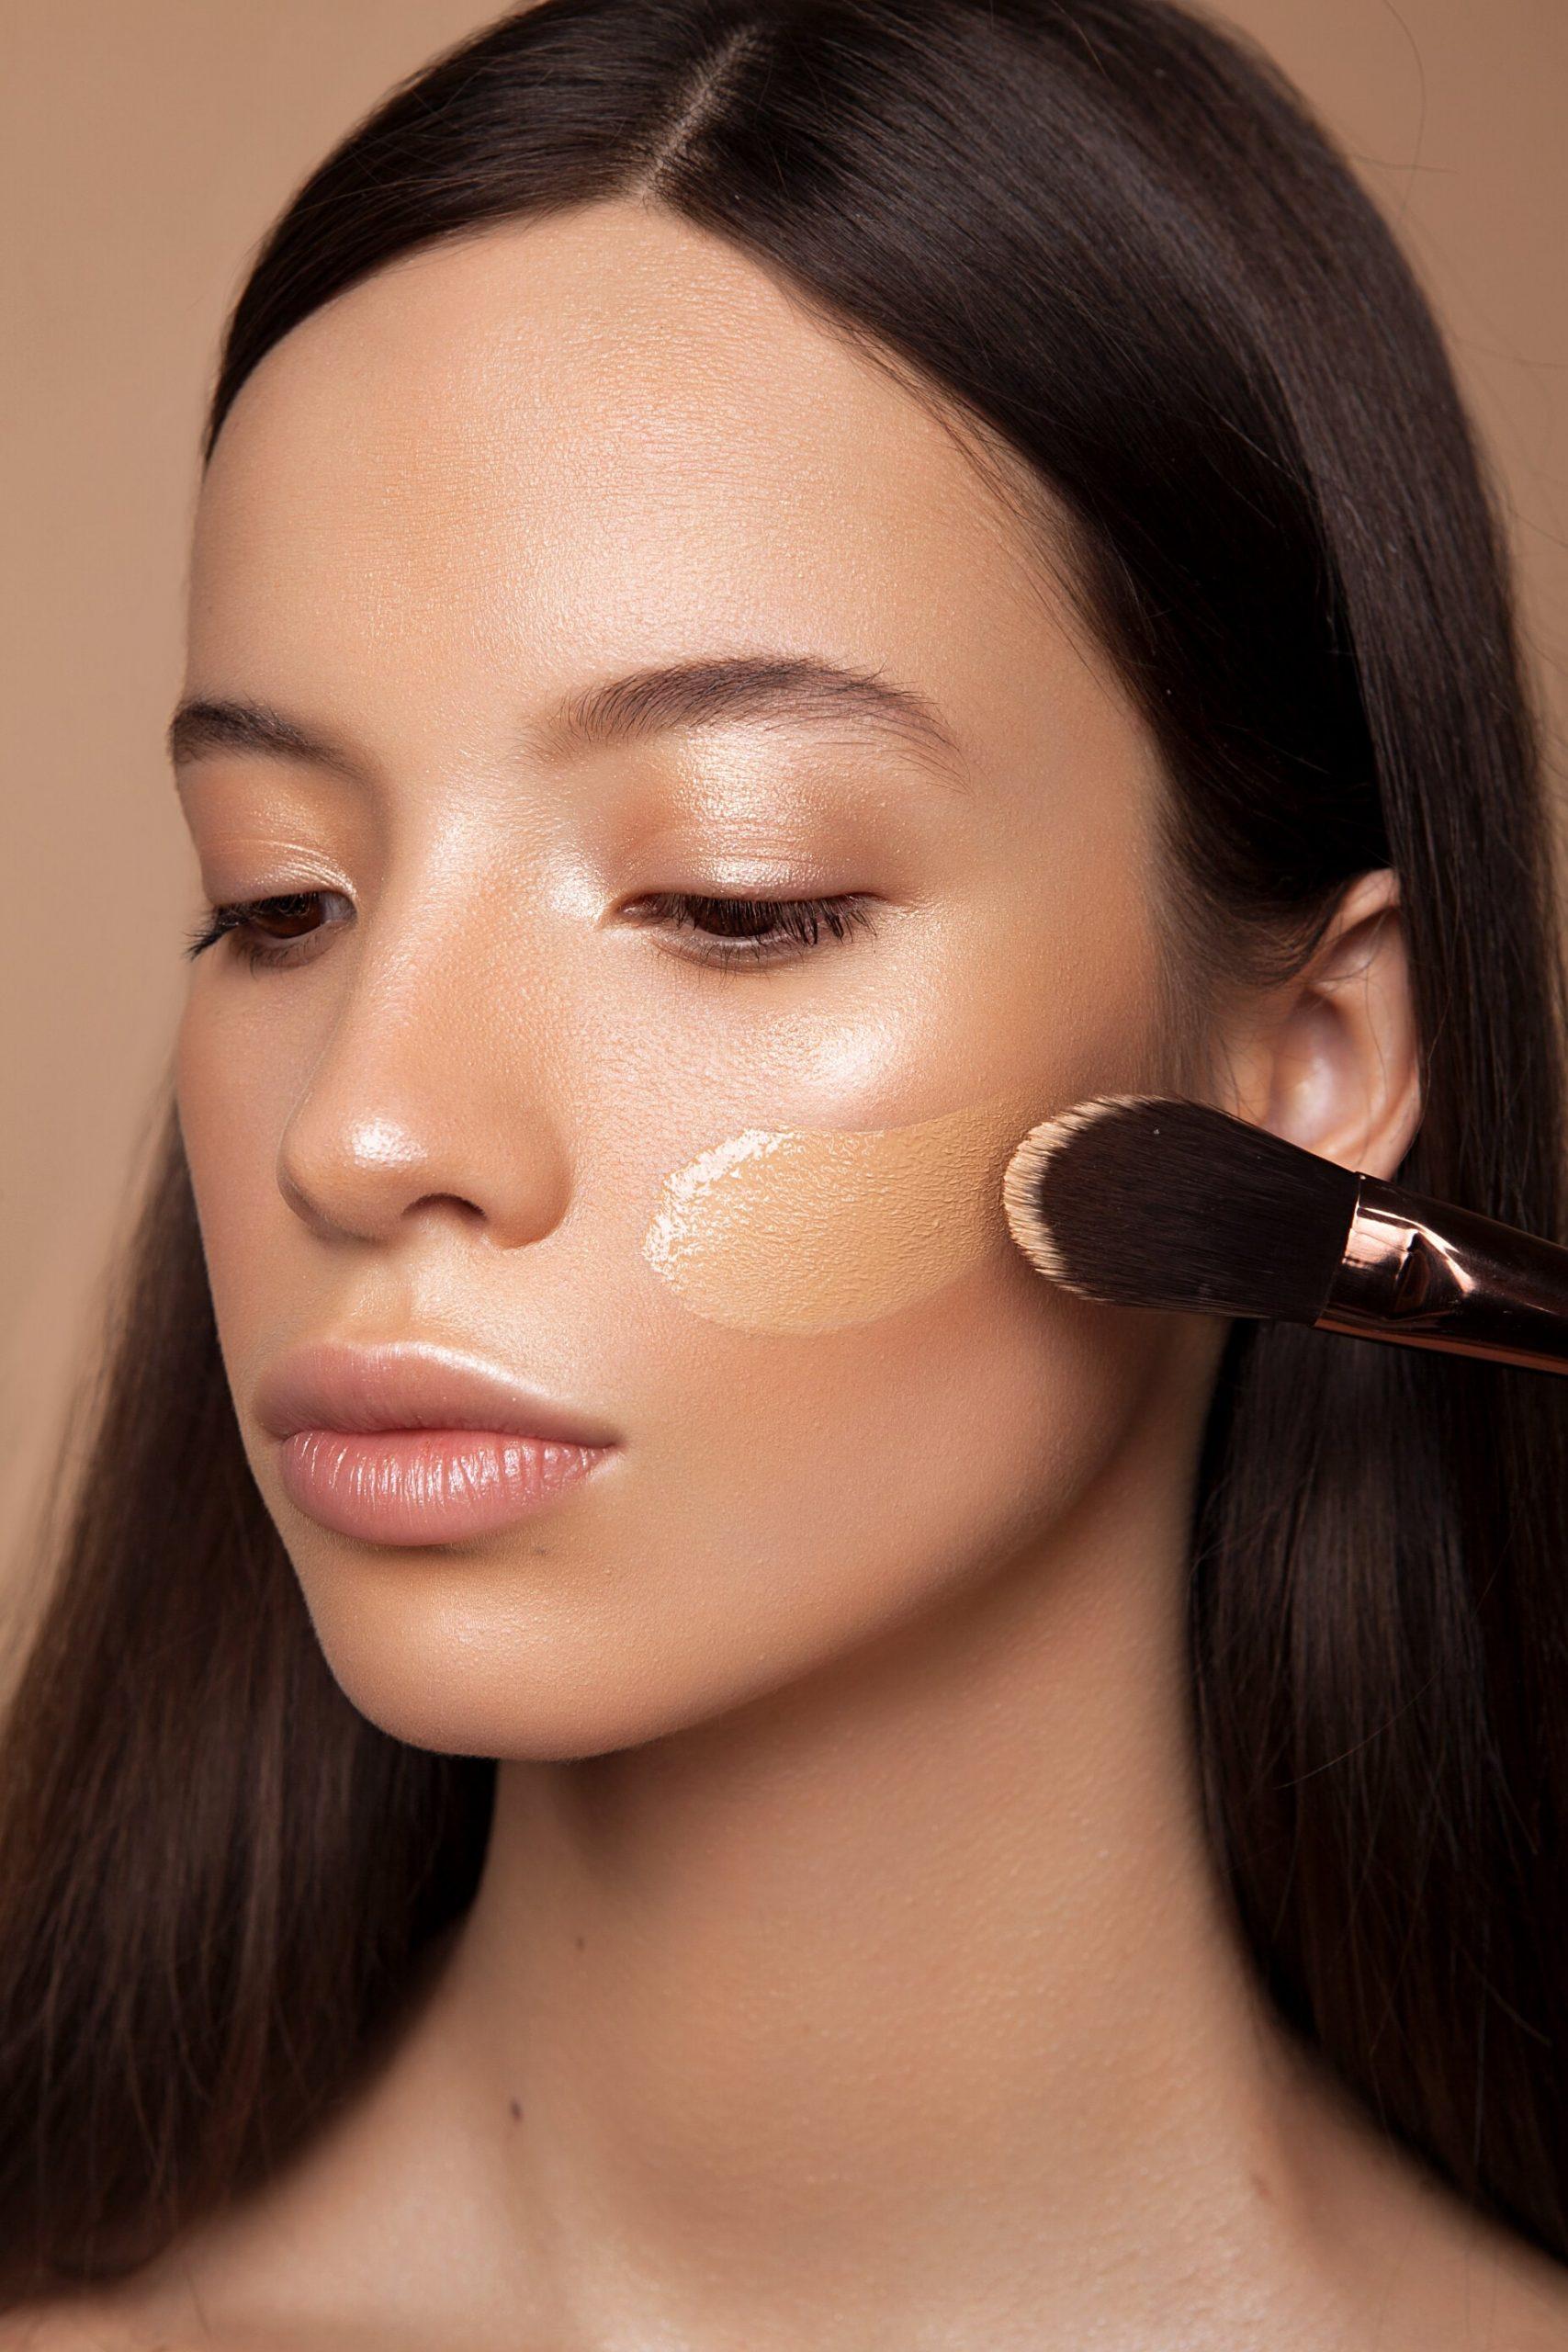 Personal make-up artist